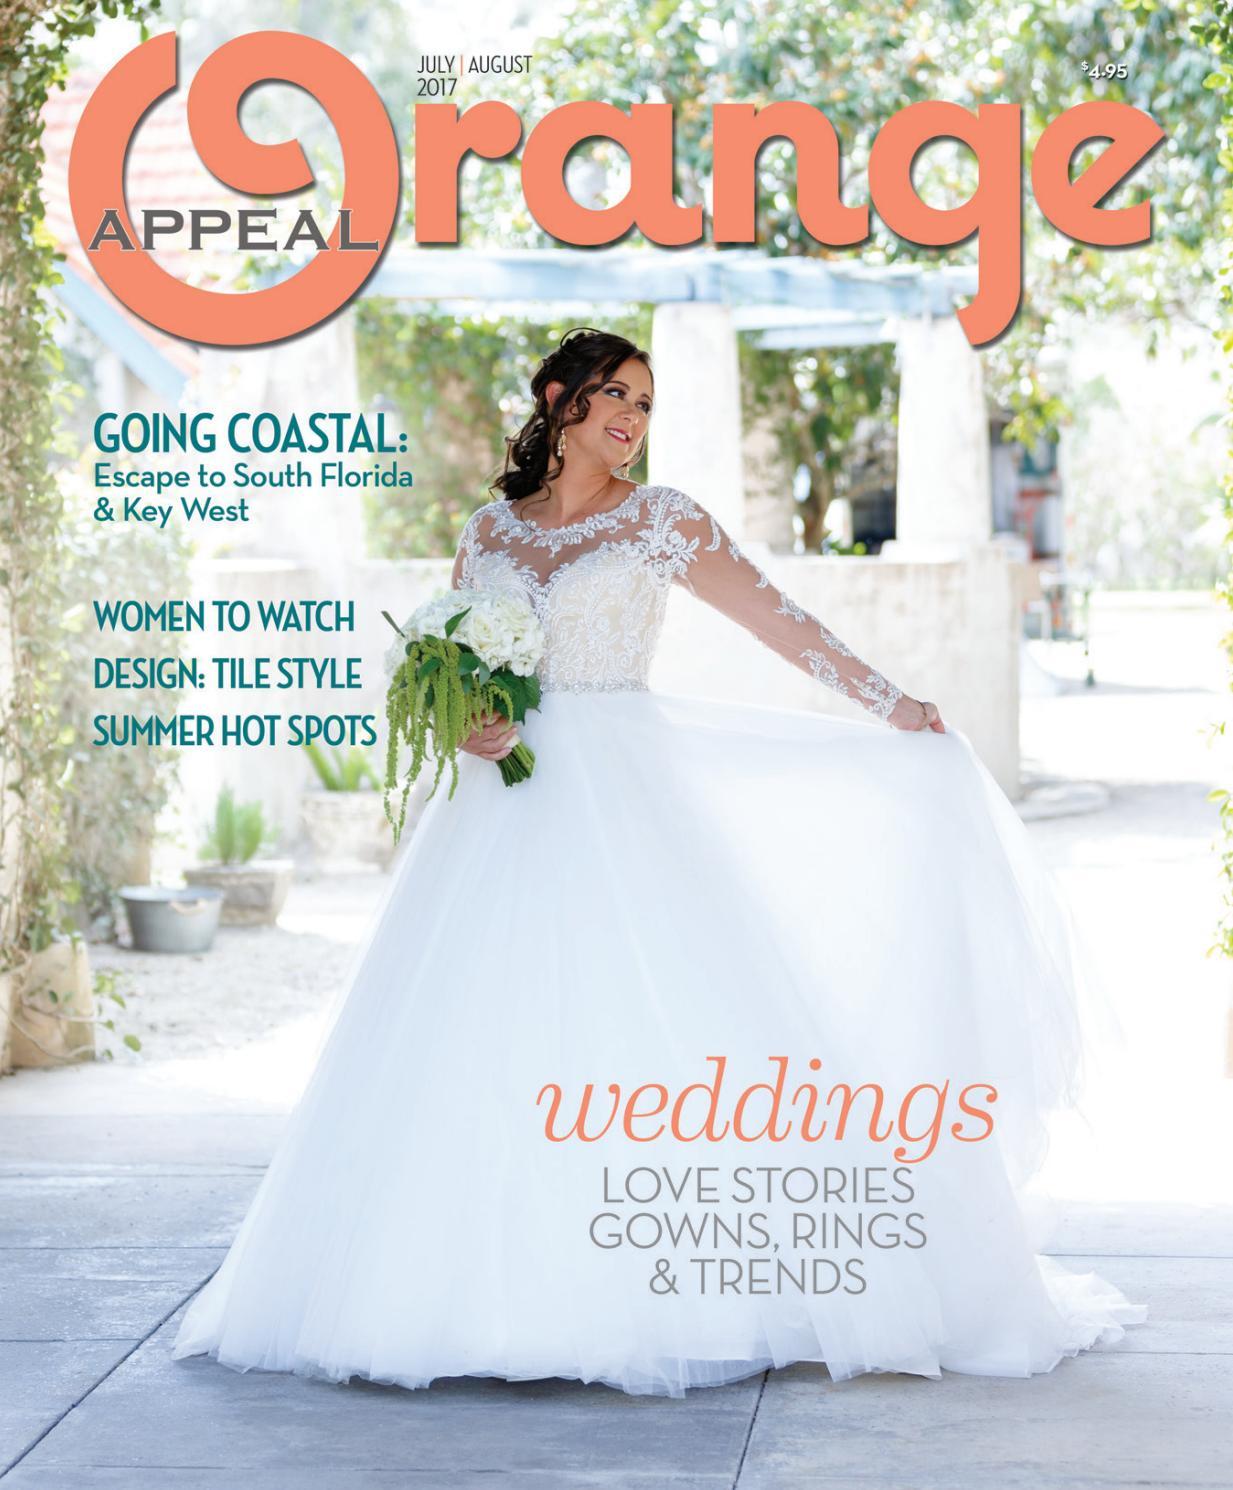 f19ed882f0e31 Orange Appeal July/August 2017 by Orange Appeal - issuu